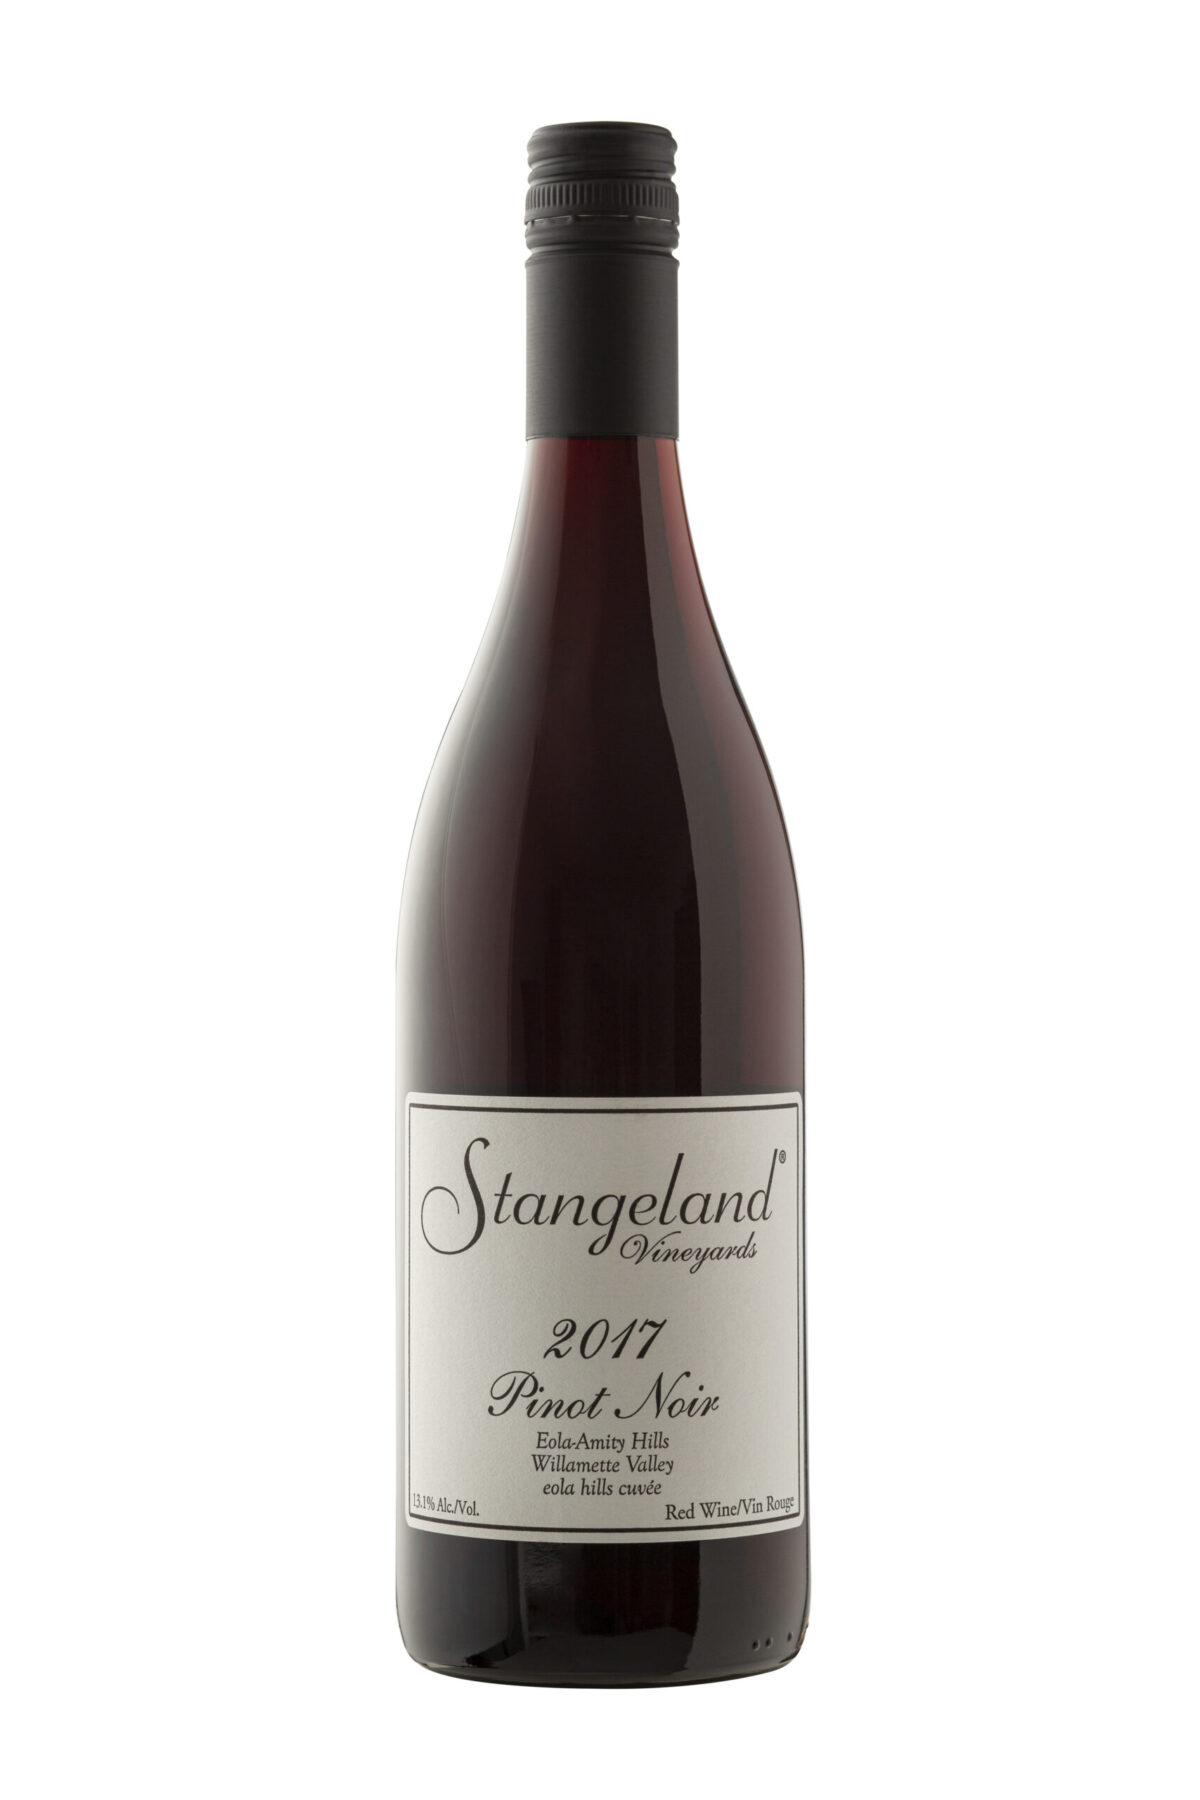 Strangeland Vinyards wine bottle.